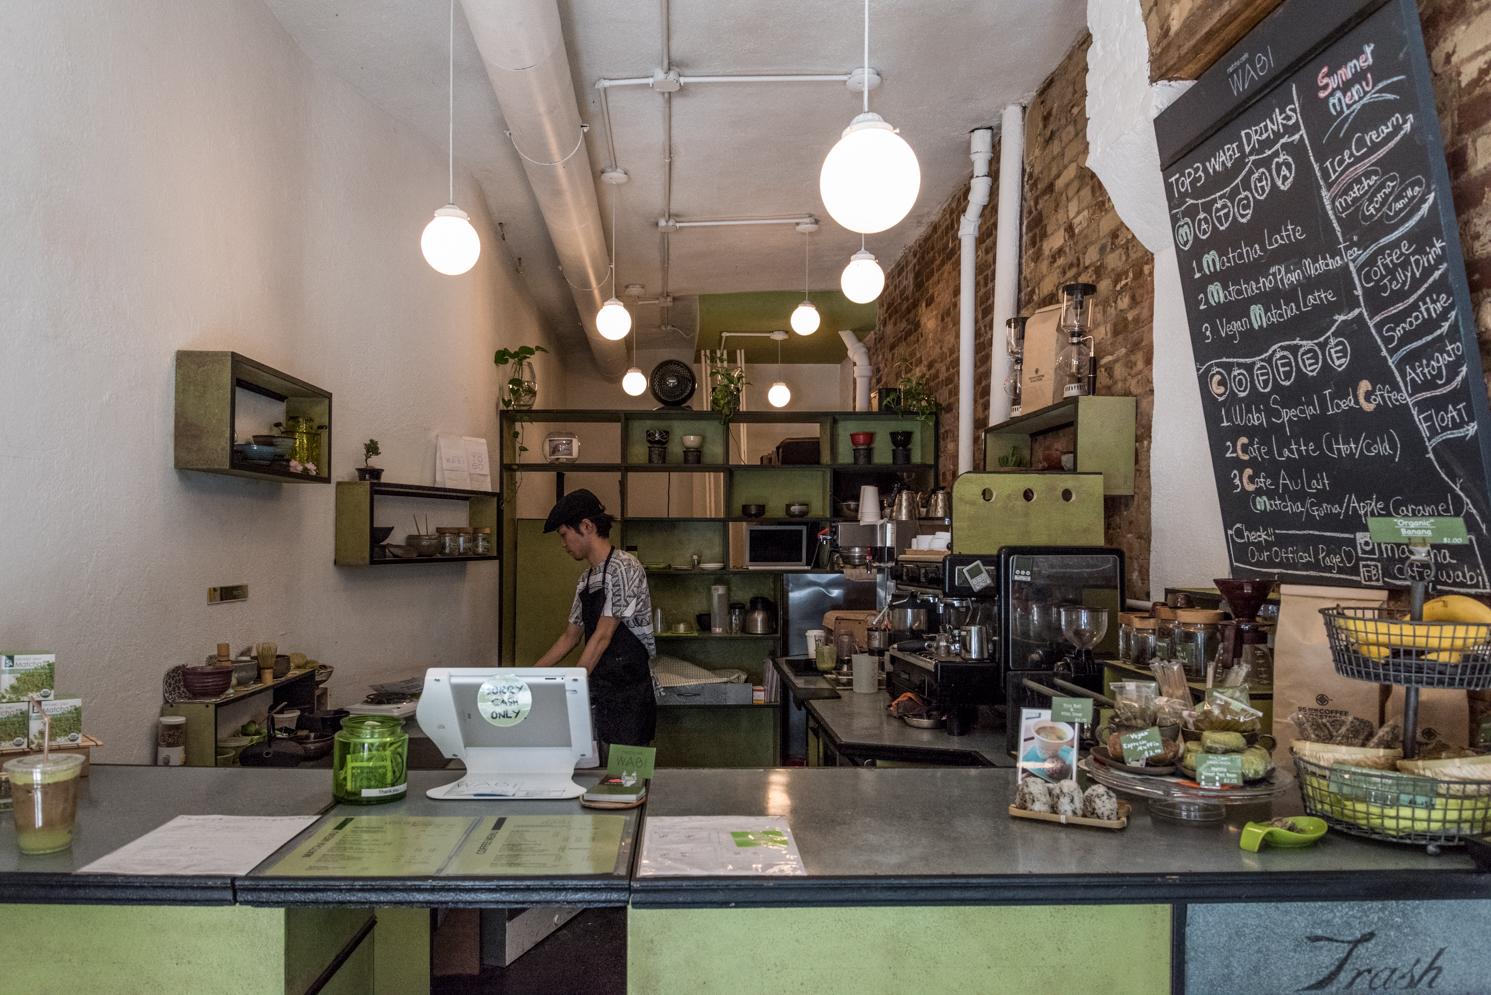 ROCK MAMA NYC LIFESTYLE BLOG - WABI-MATCHA CAFE IN THE EAST VILLAGE